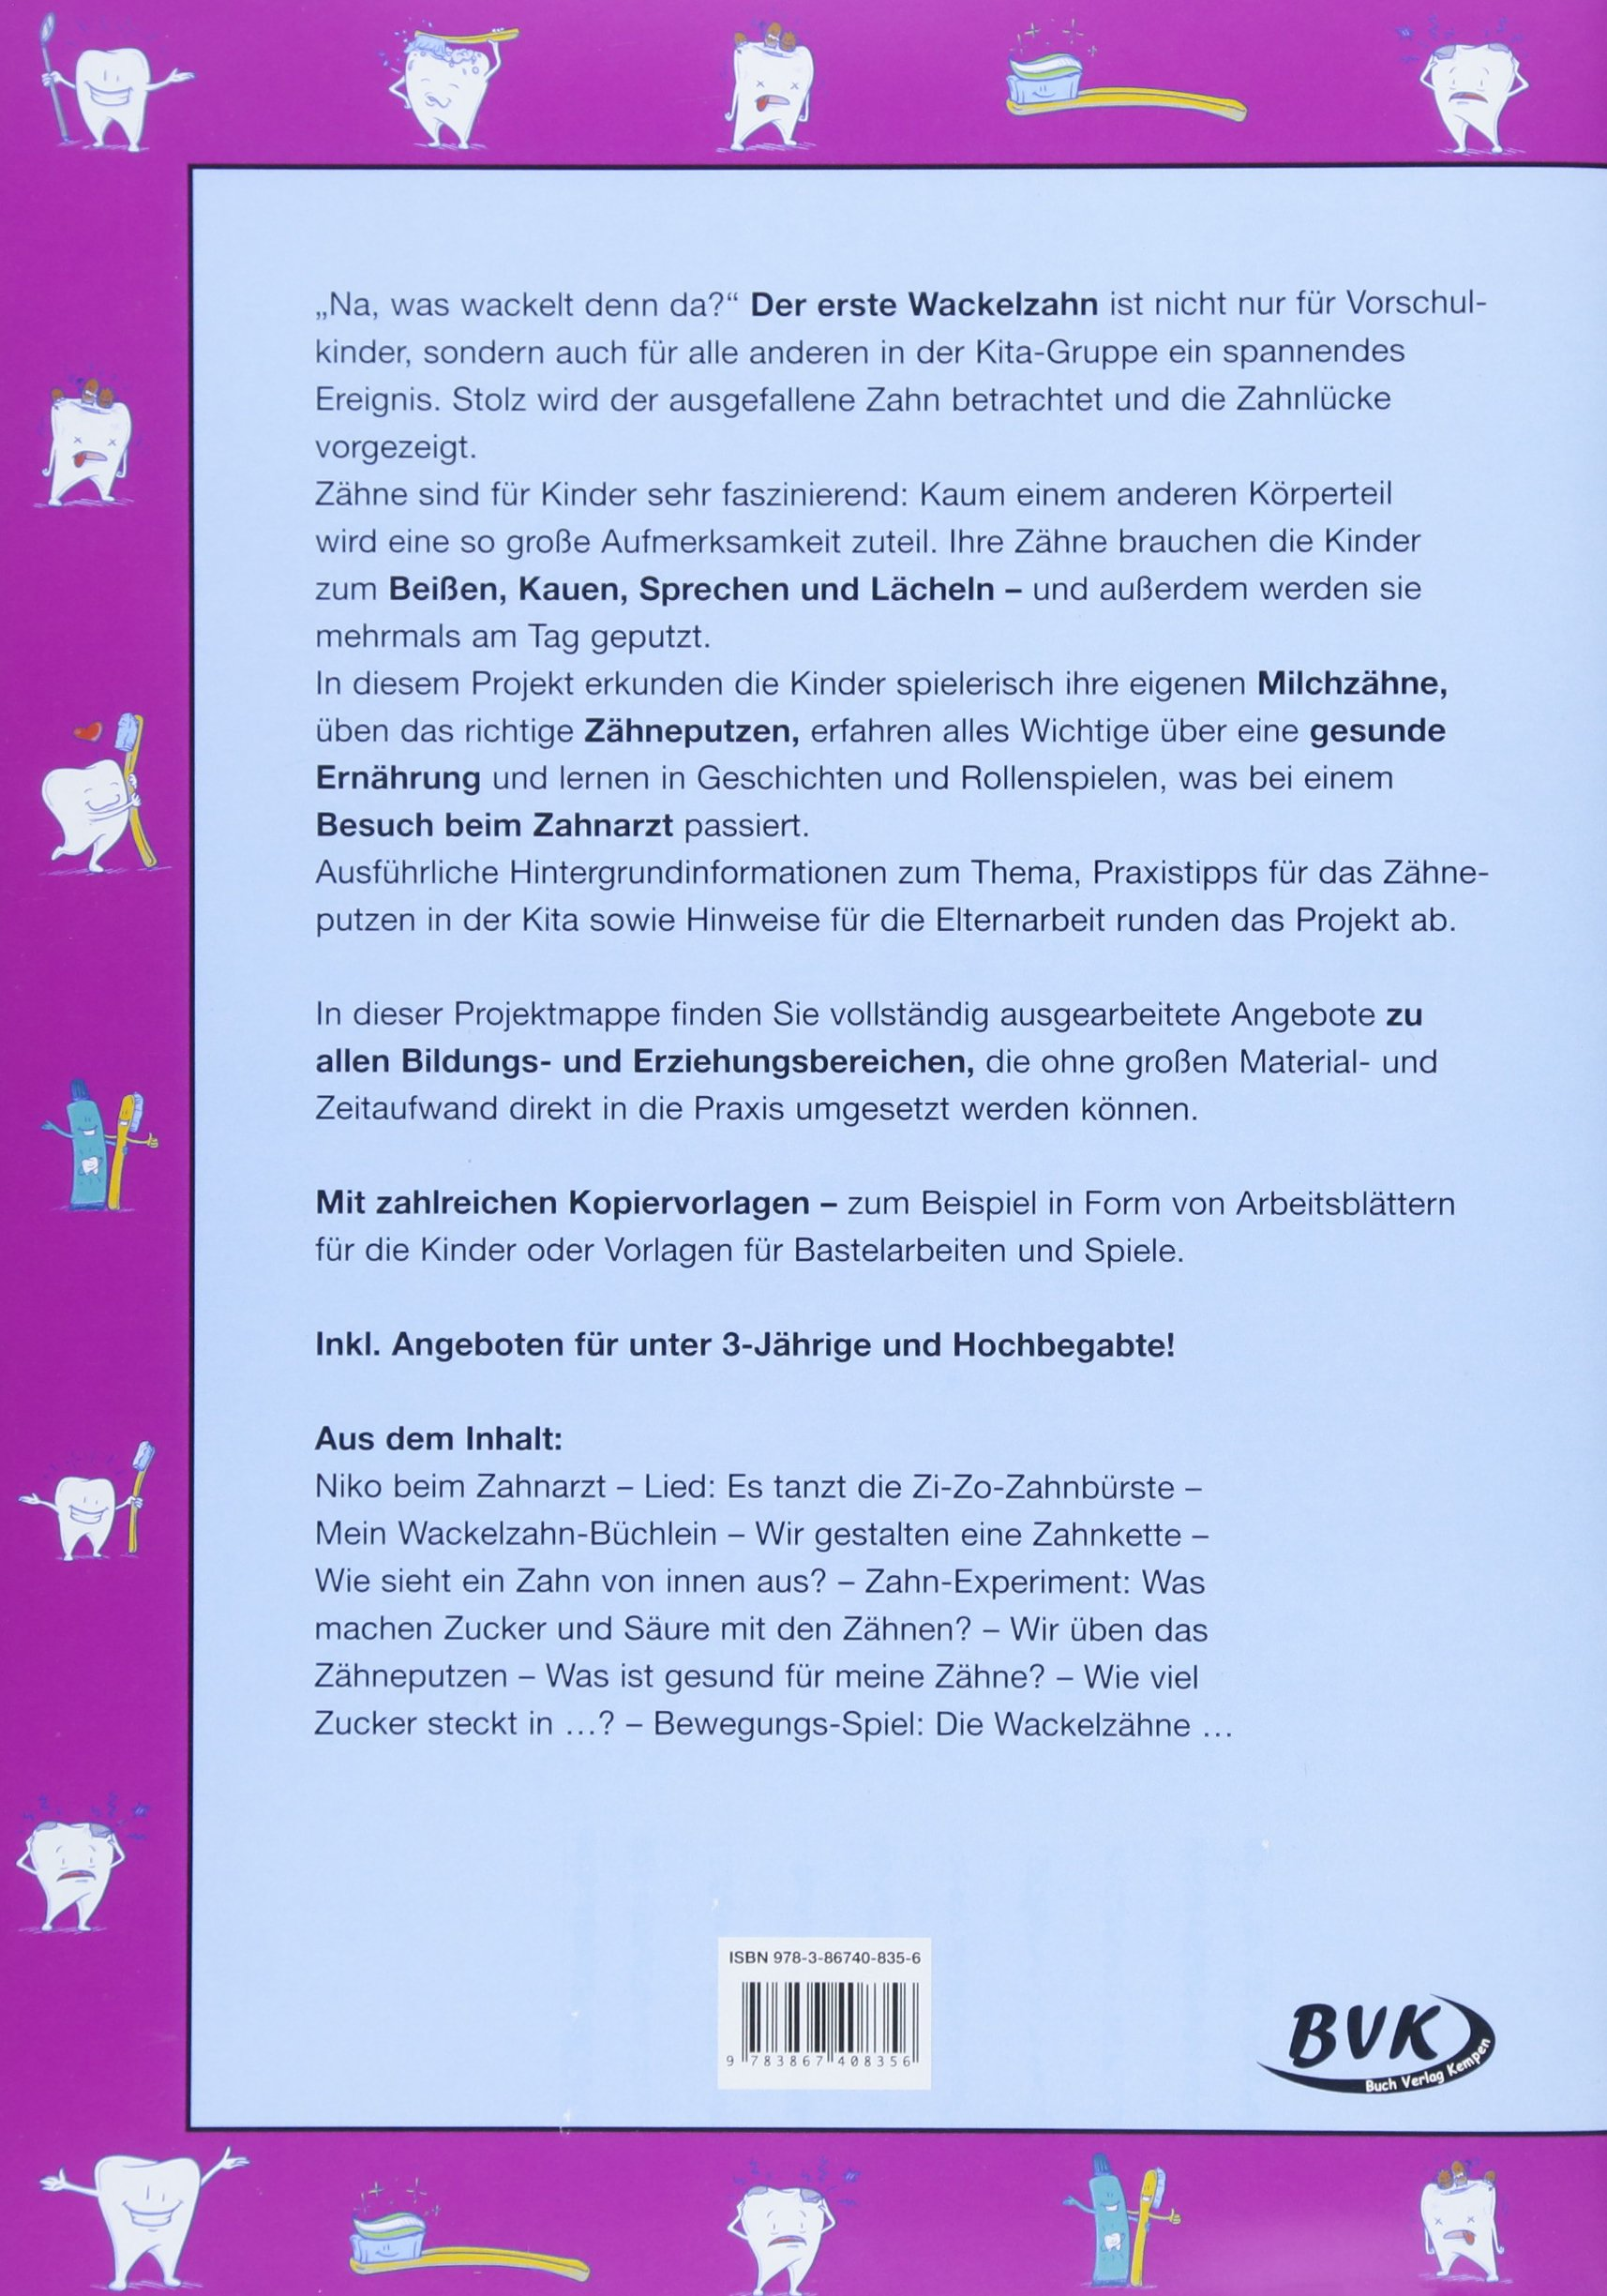 Kita aktiv Projektmappe Zähne: 9783867408356: Amazon.com: Books